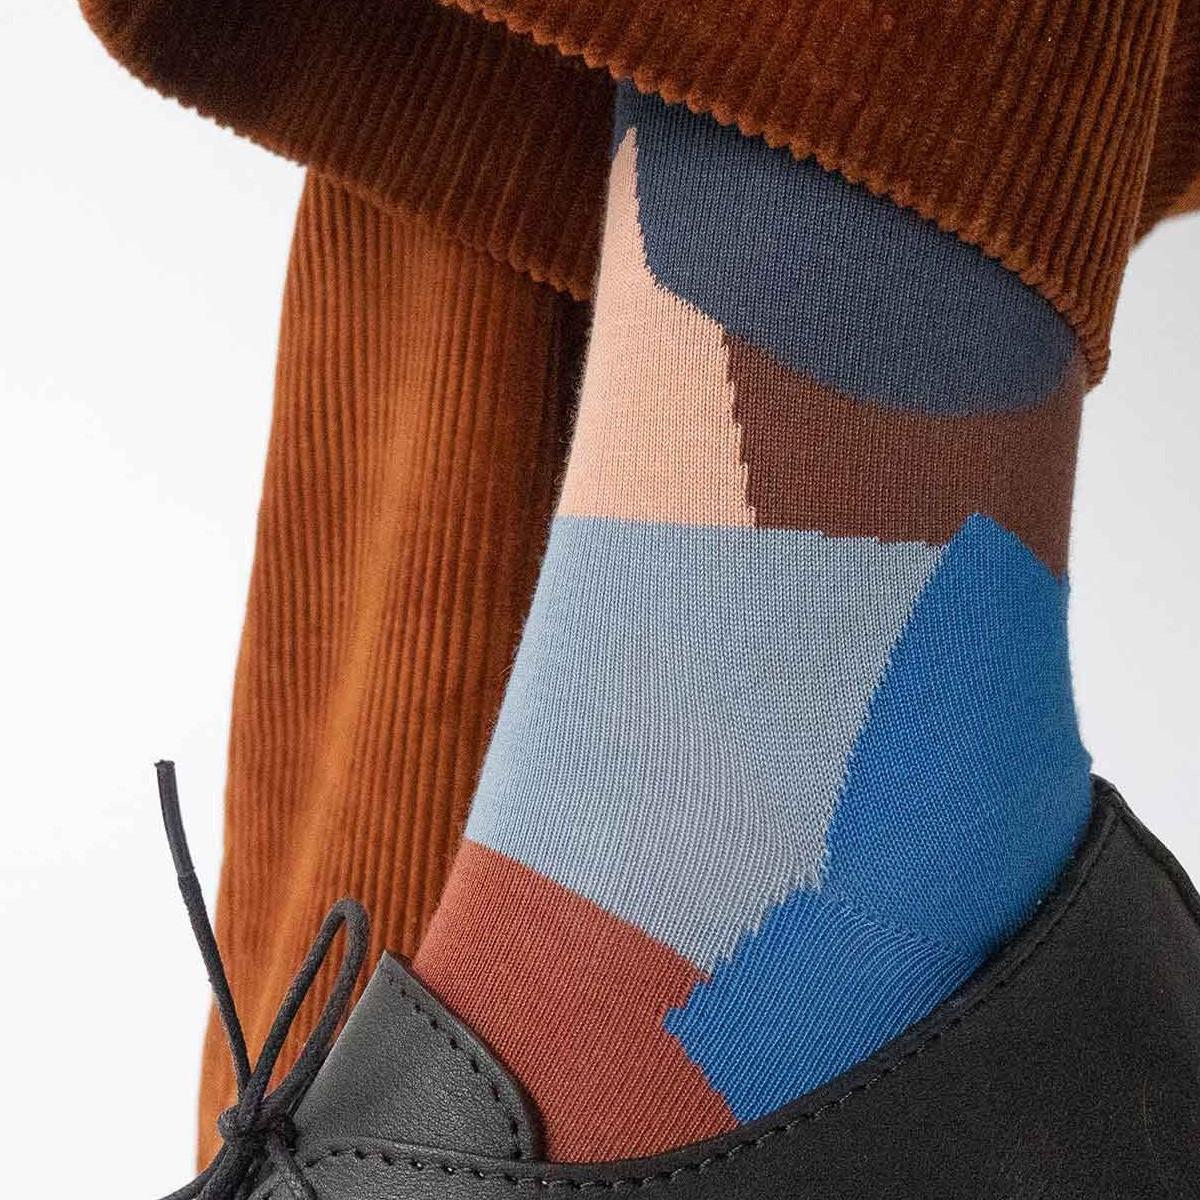 kolorowe skarpetki damskie